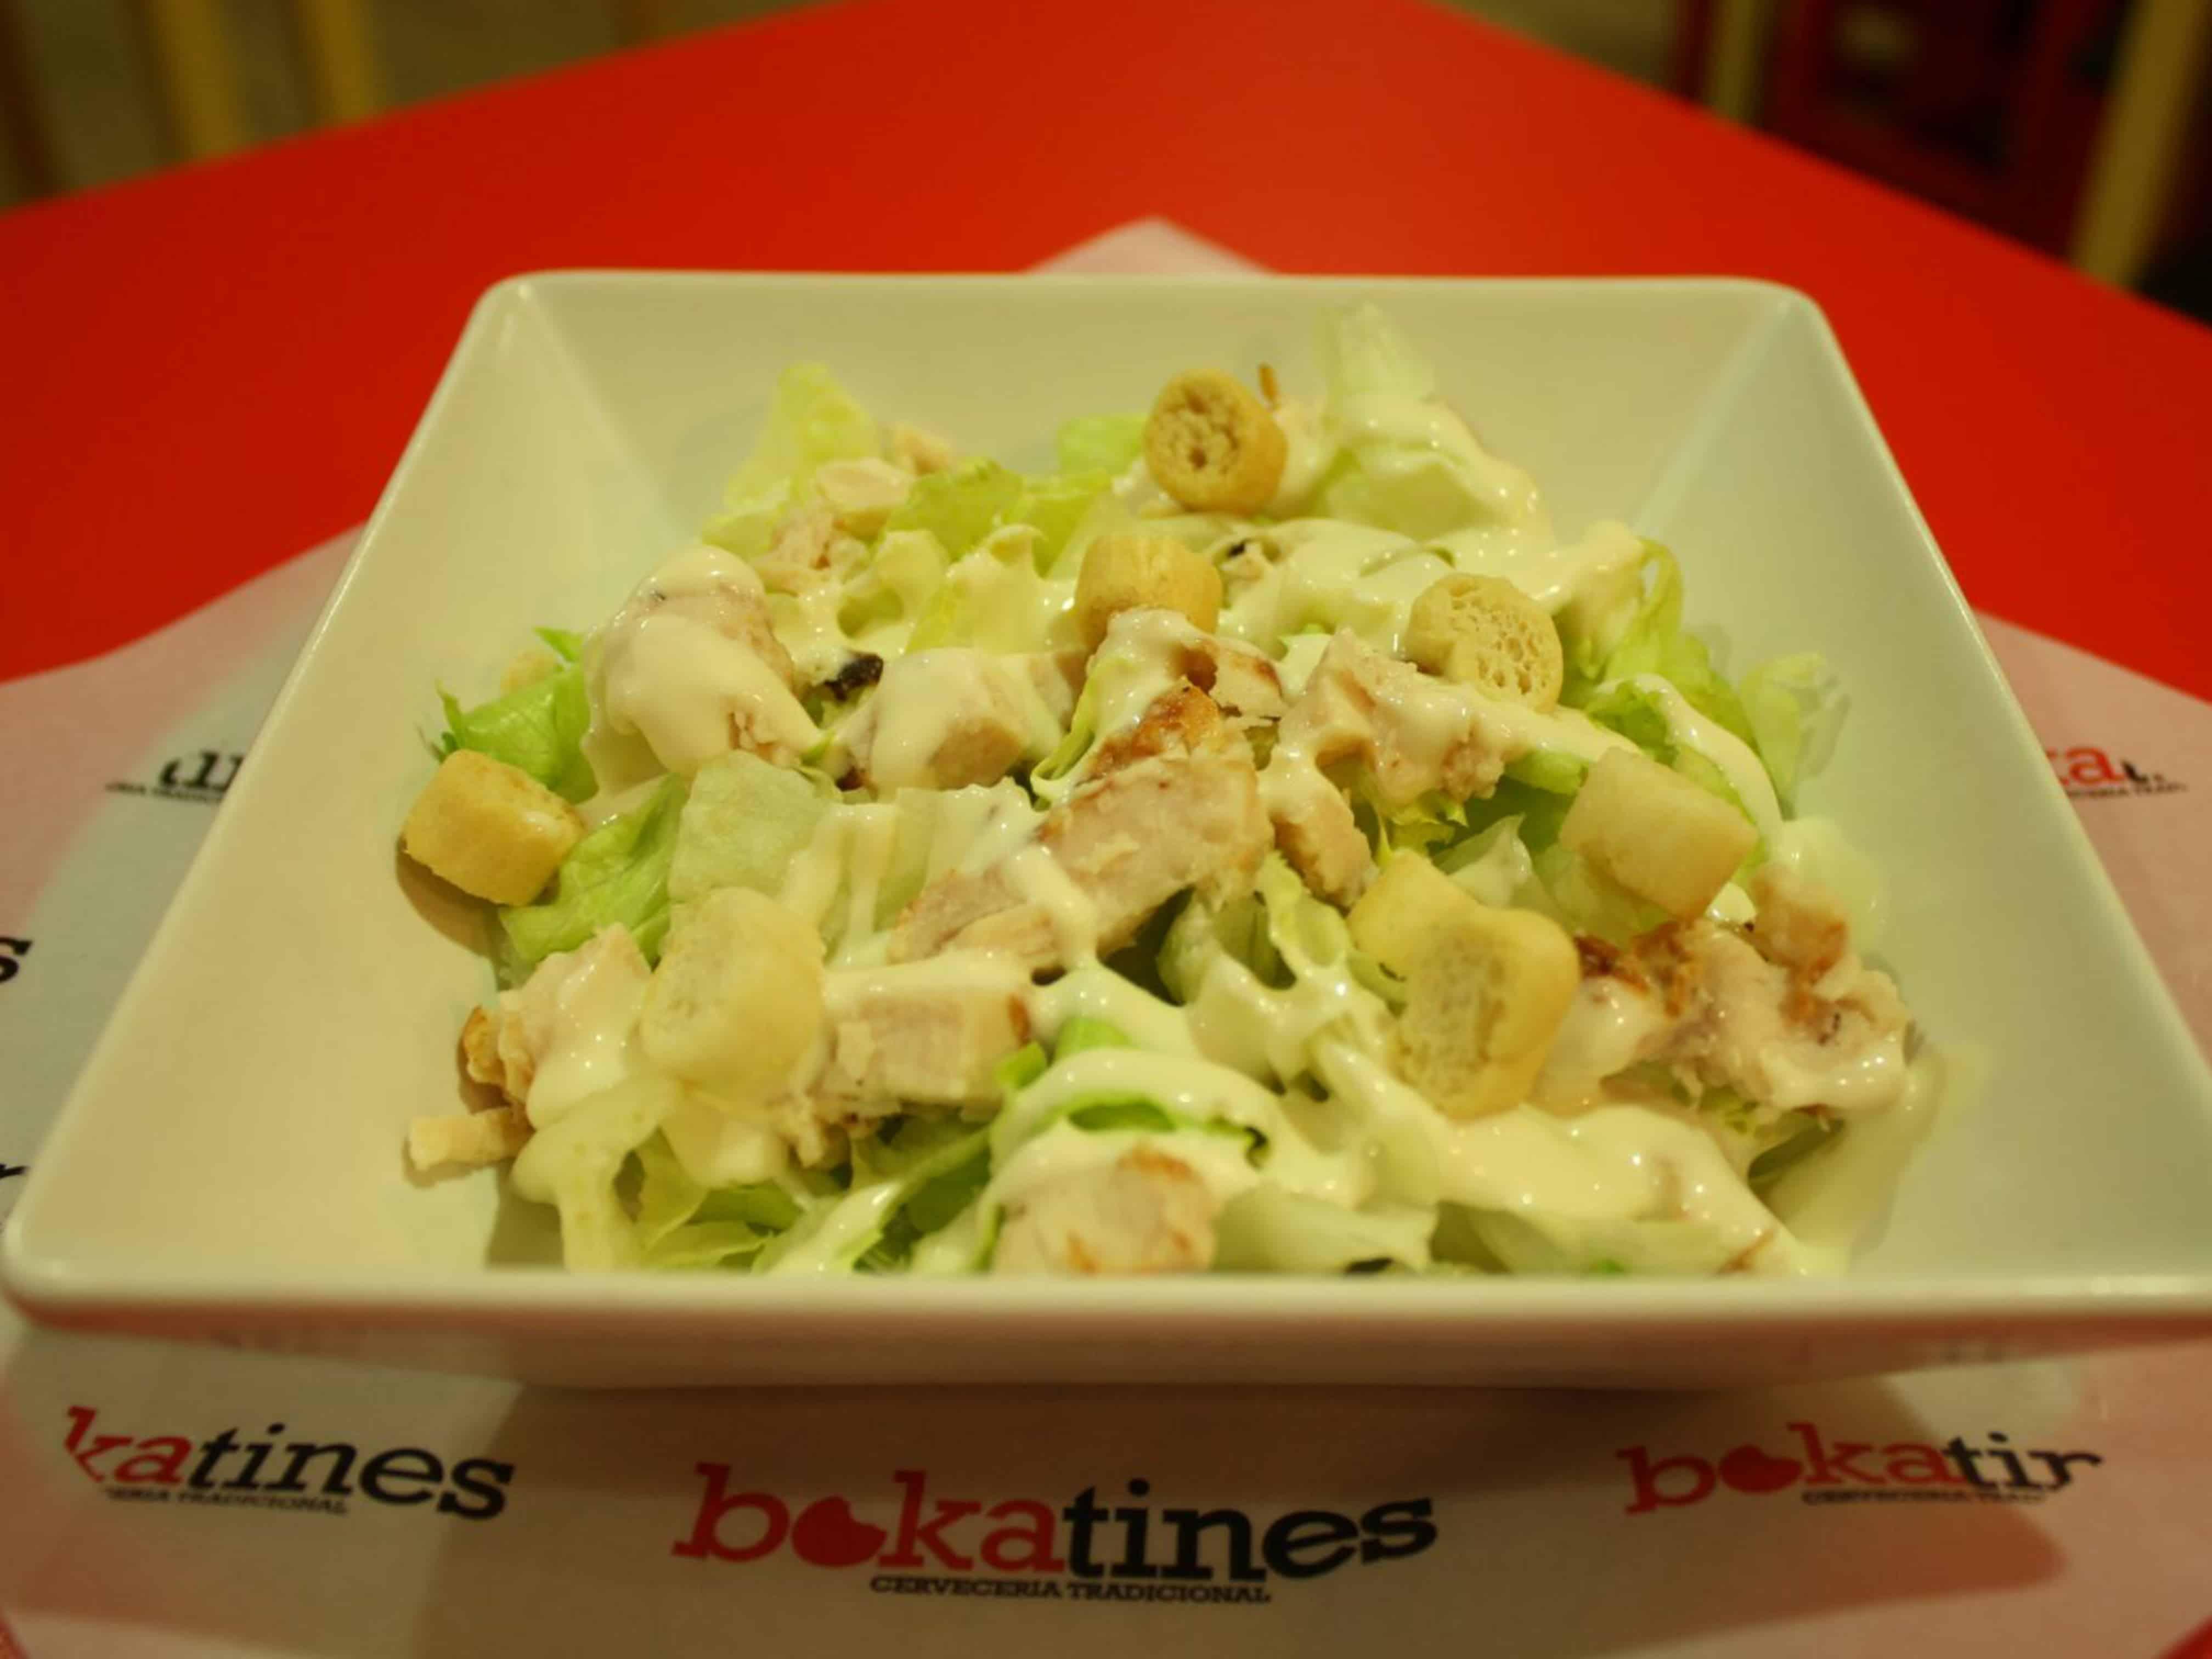 bokatines restaurante ensalada cesar